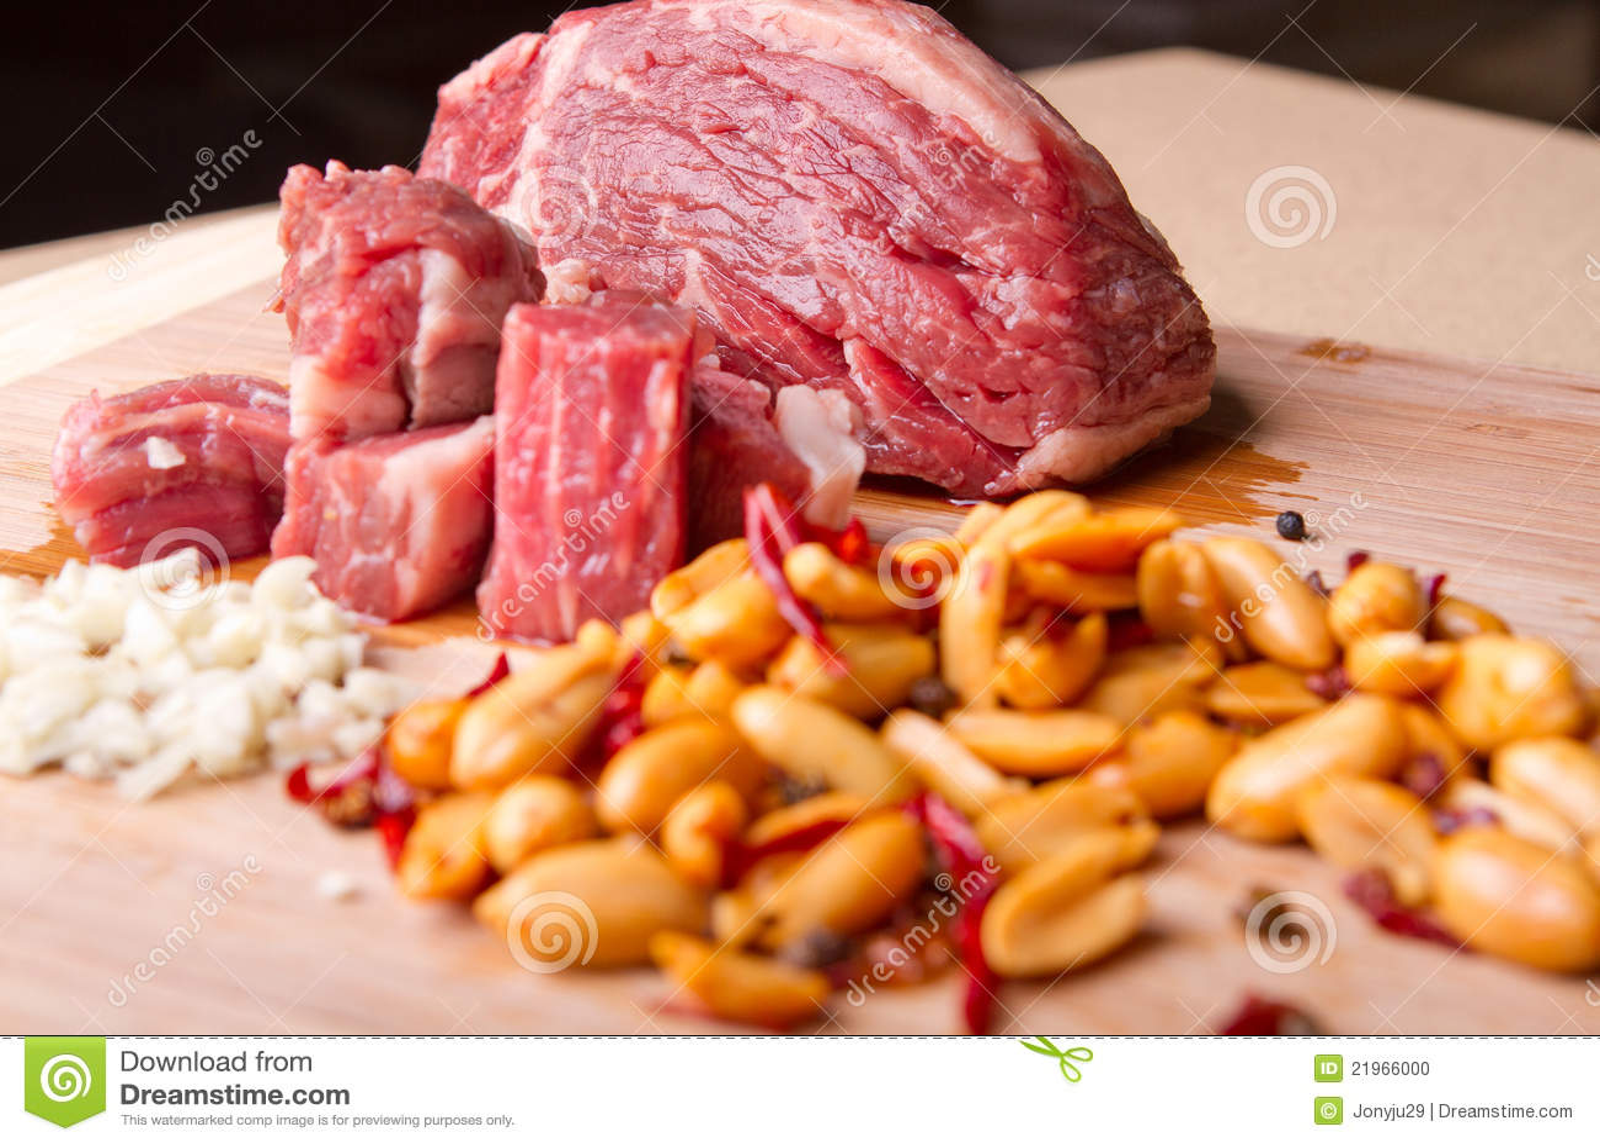 Beef Garlic And Spicy Peanut Prep Stock Photo - Image: 21966000